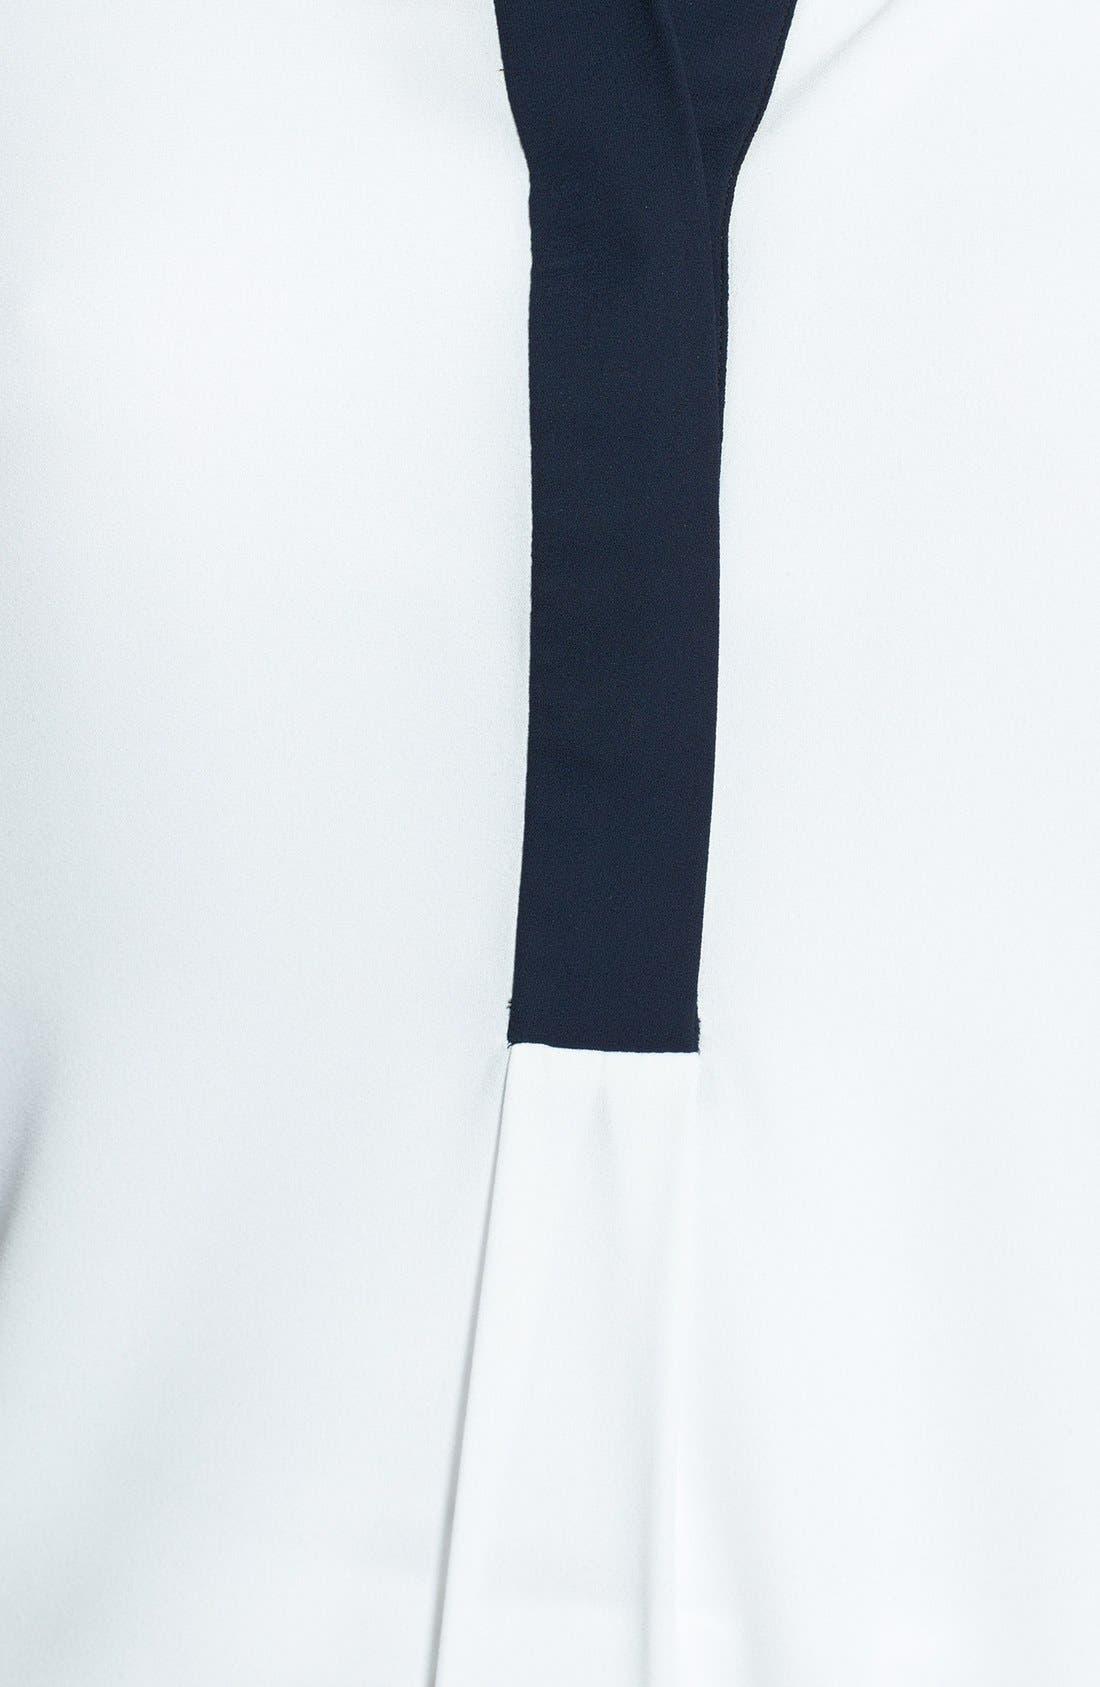 Alternate Image 3  - Vince Camuto Contrast Trim Roll Sleeve Blouse (Regular & Petite)